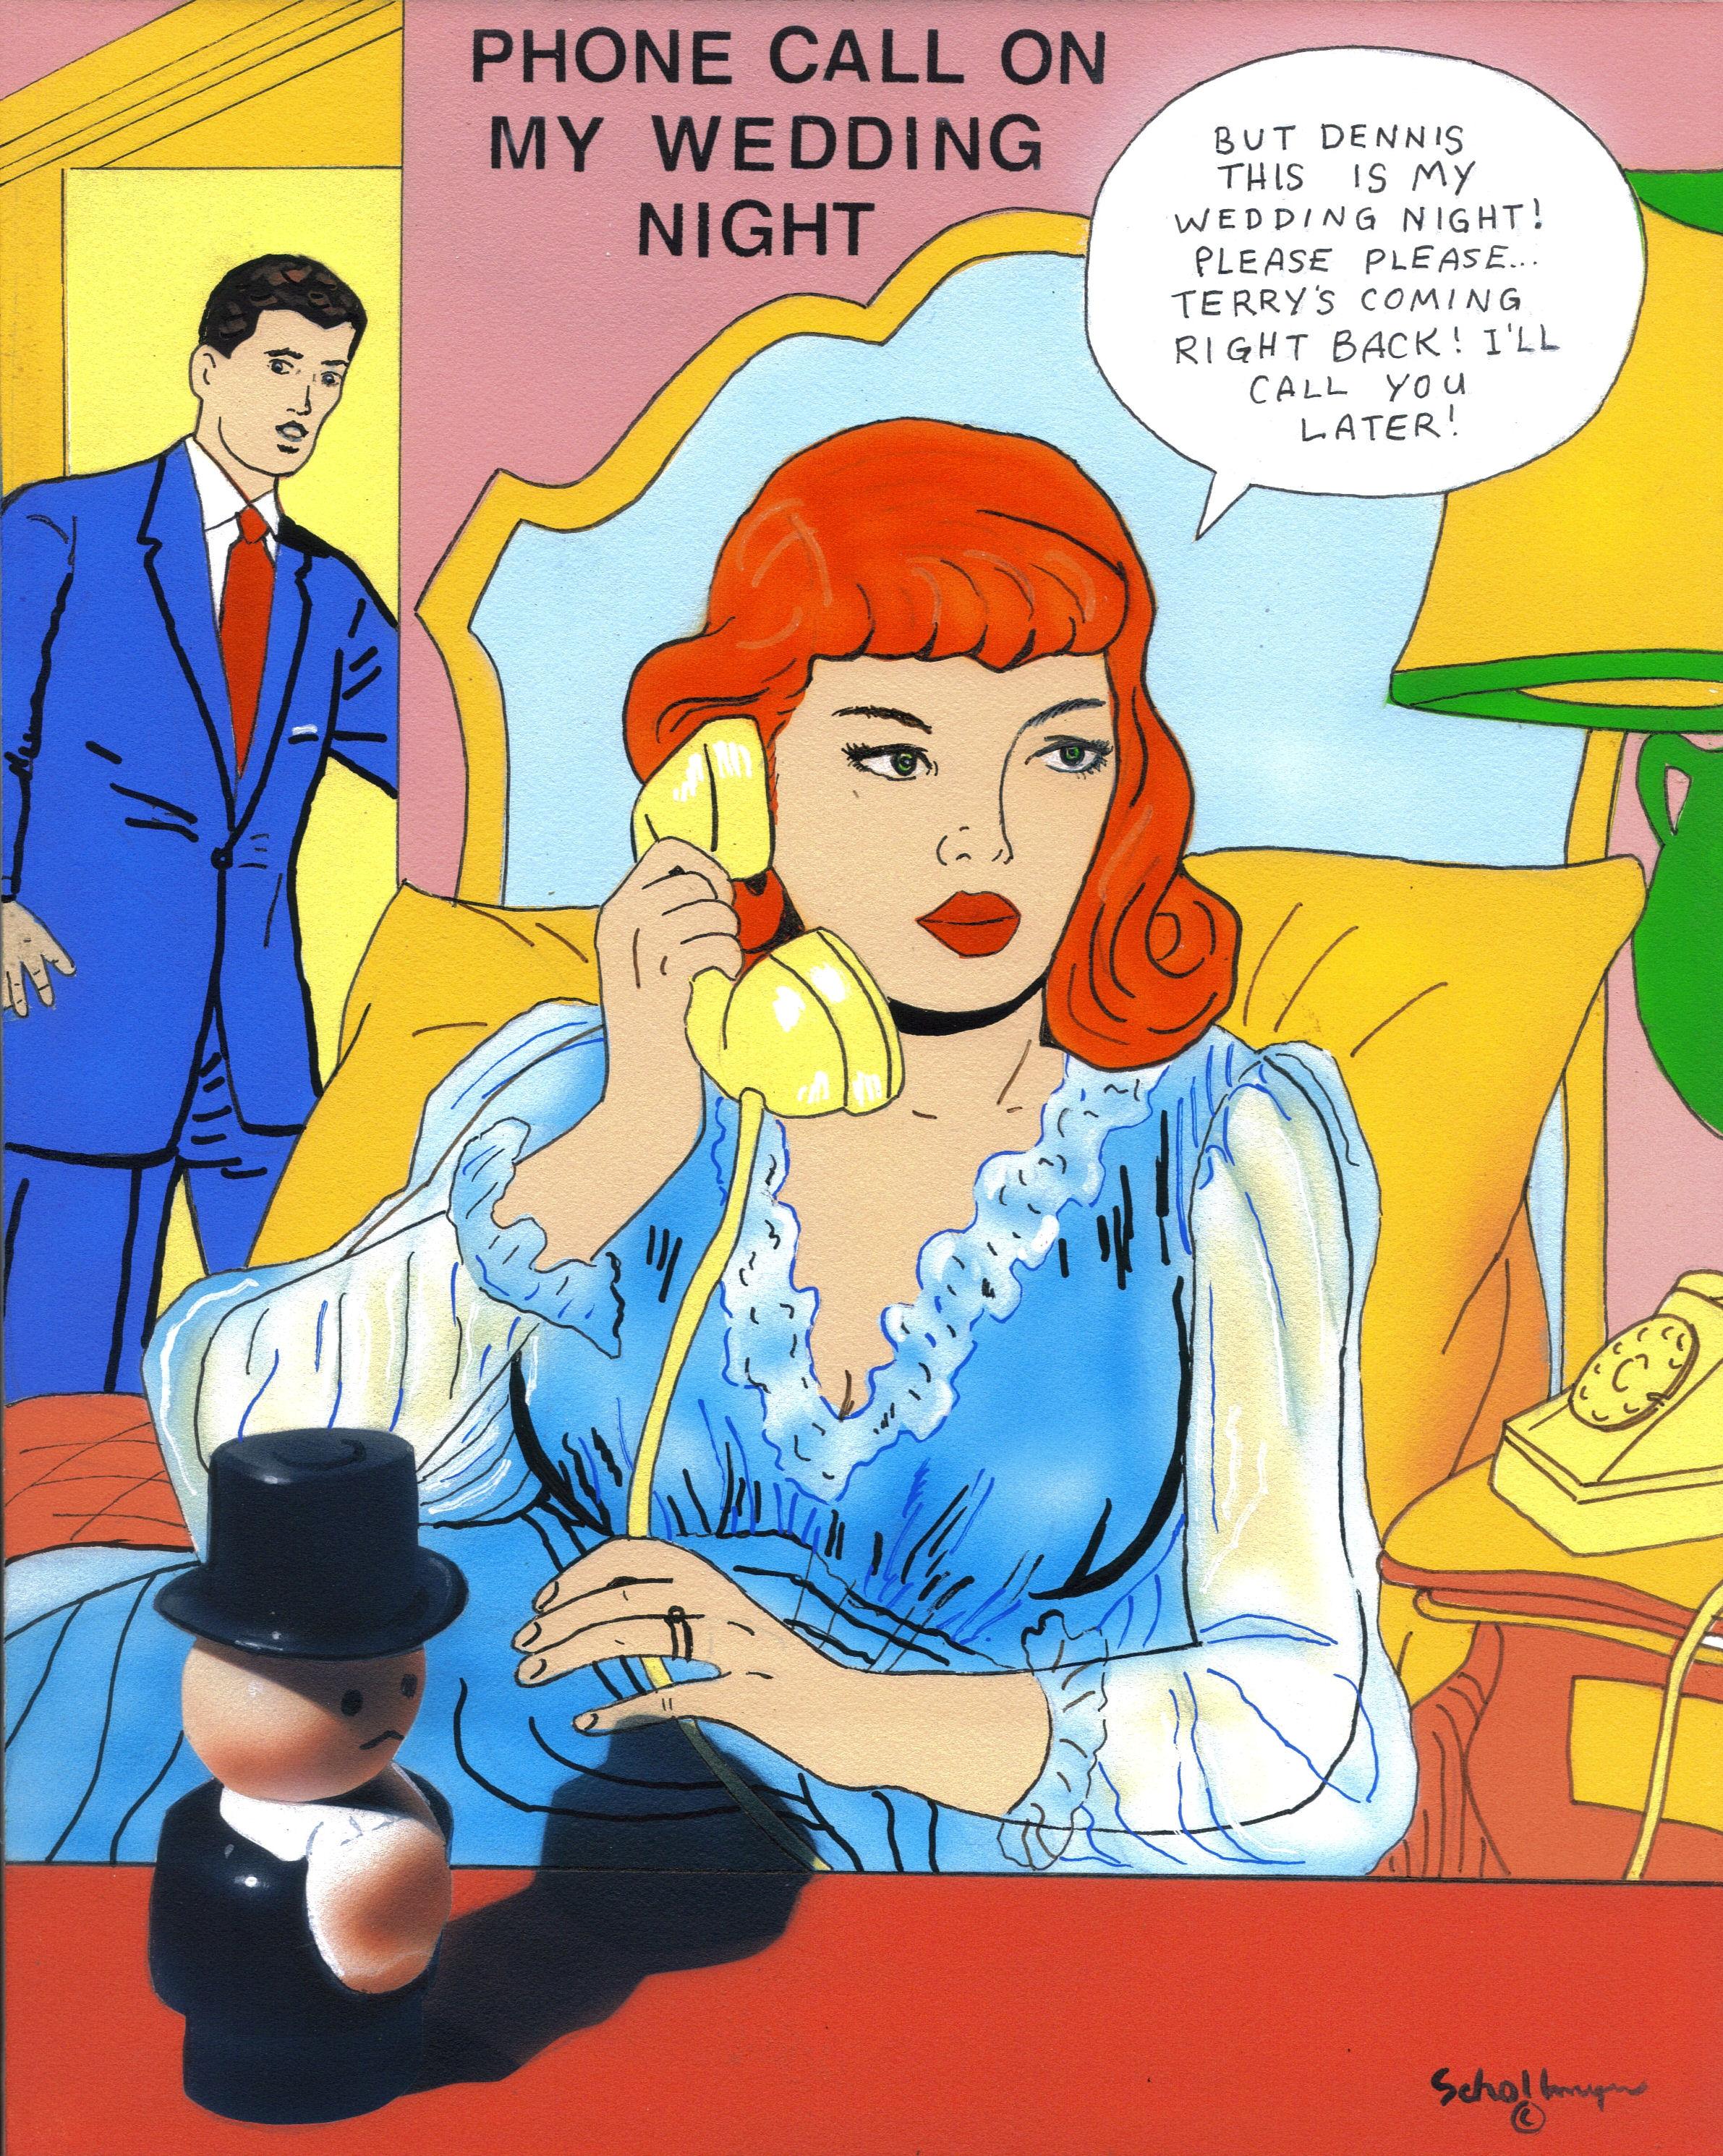 Phone Call On My Wedding Night